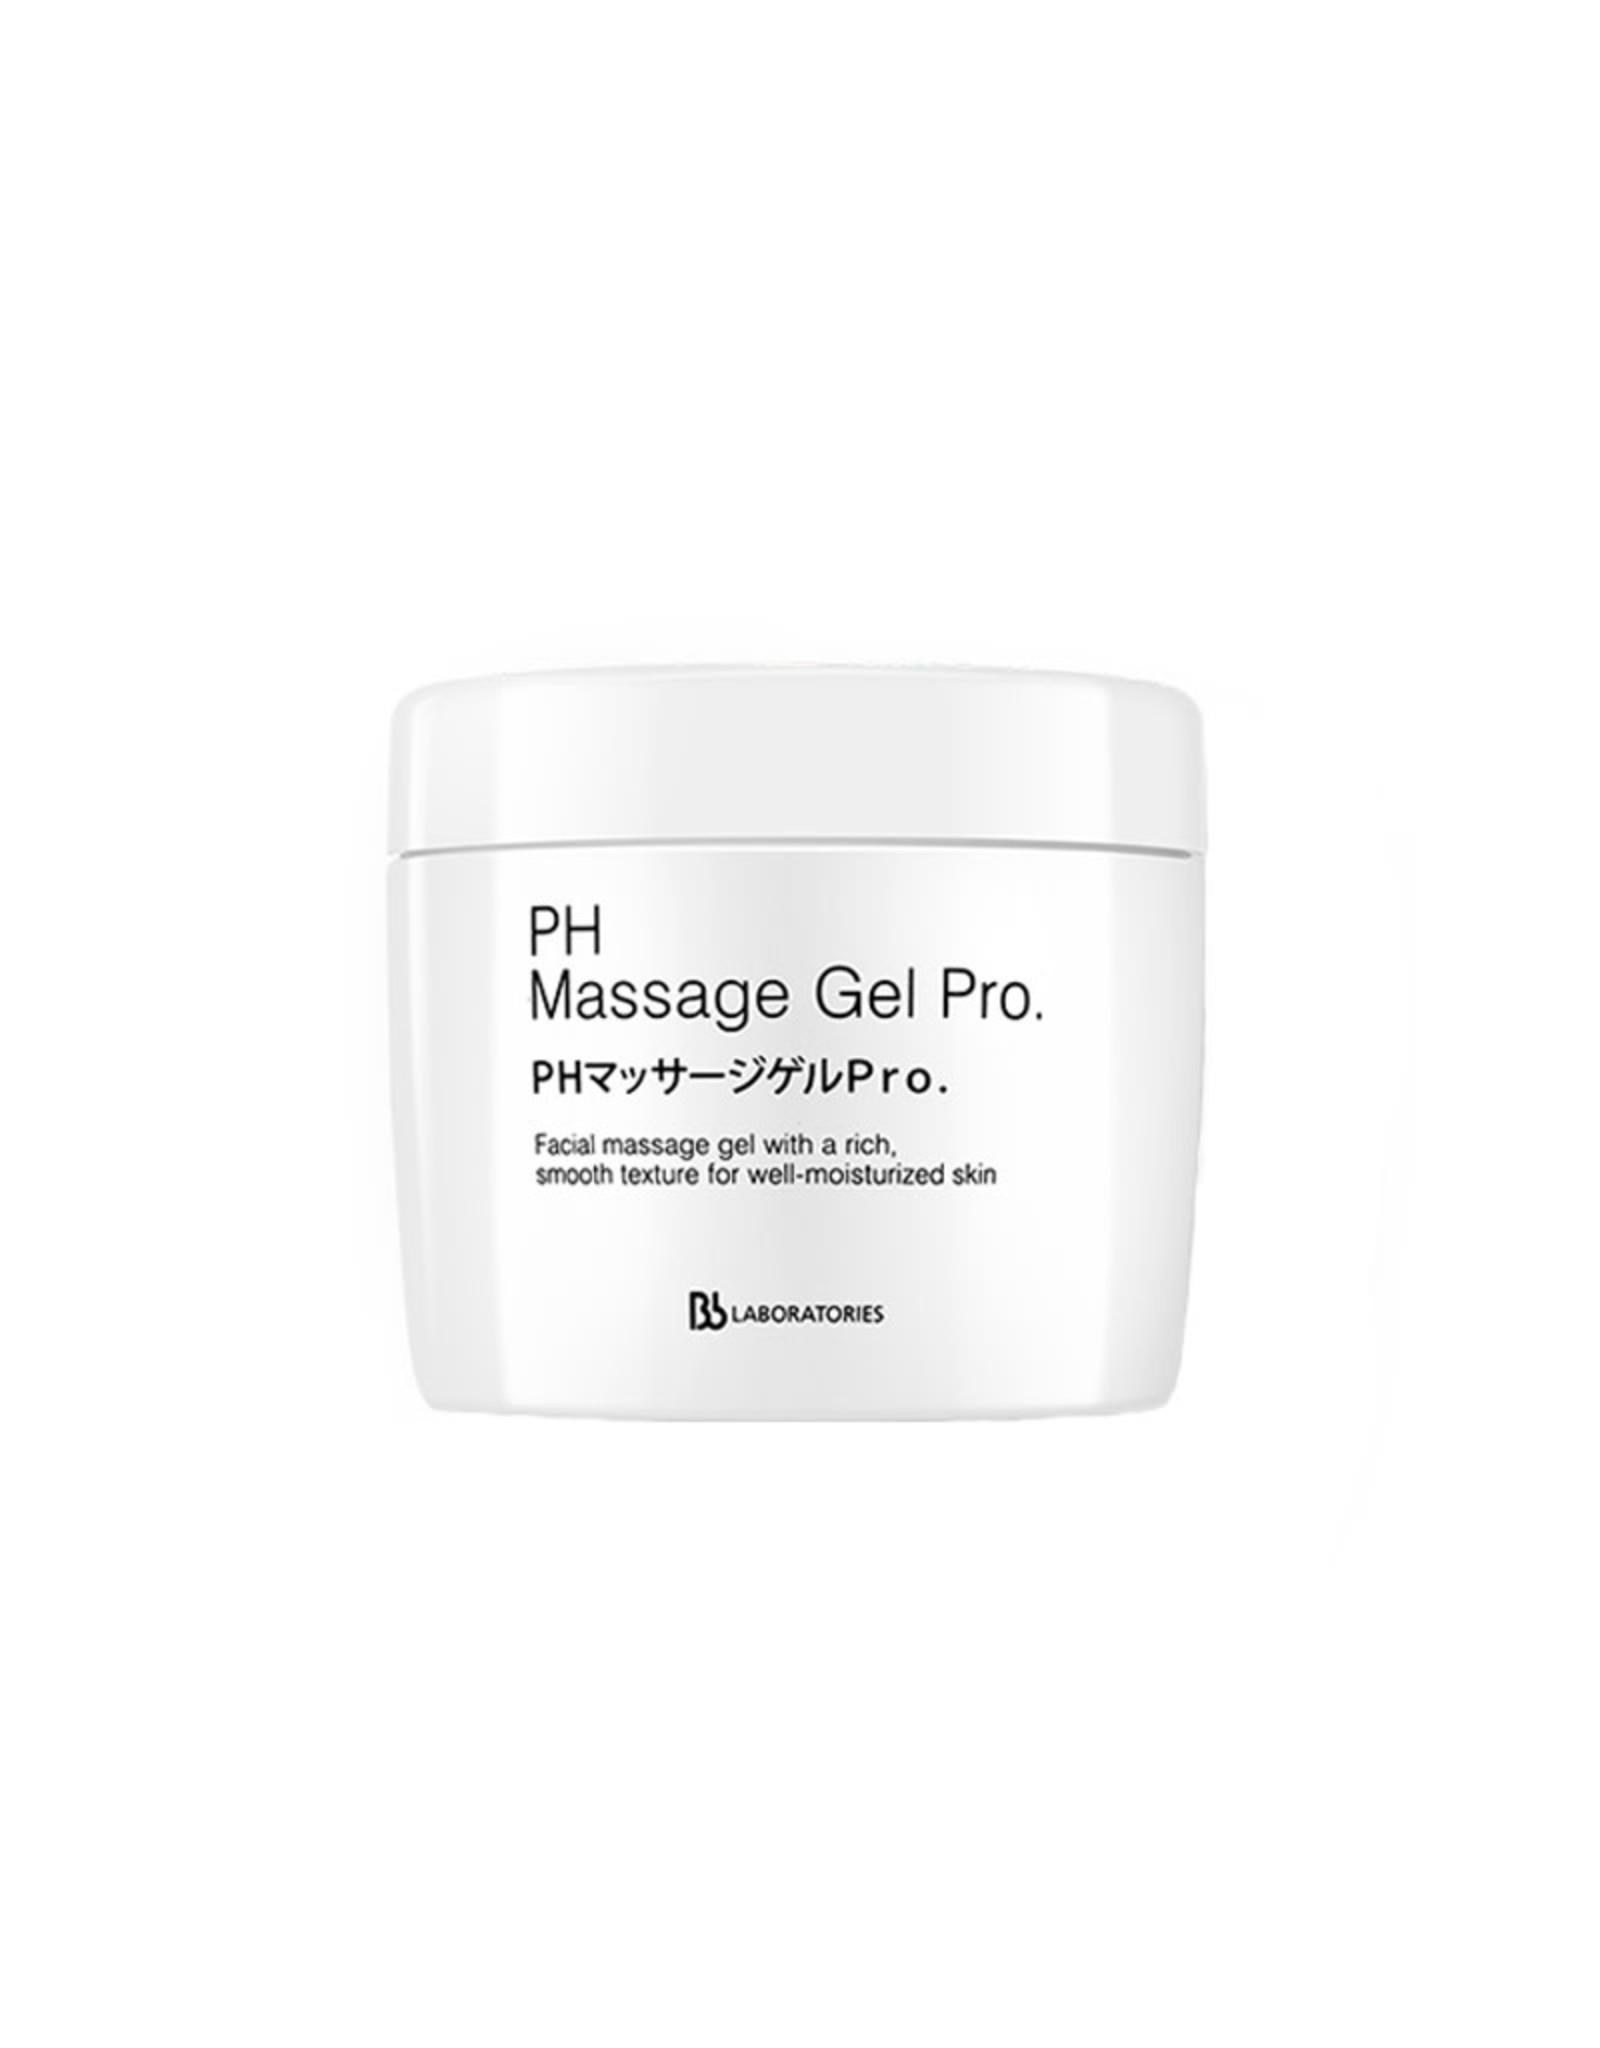 BB Laboratories BBLab PH Massage Gel Pro